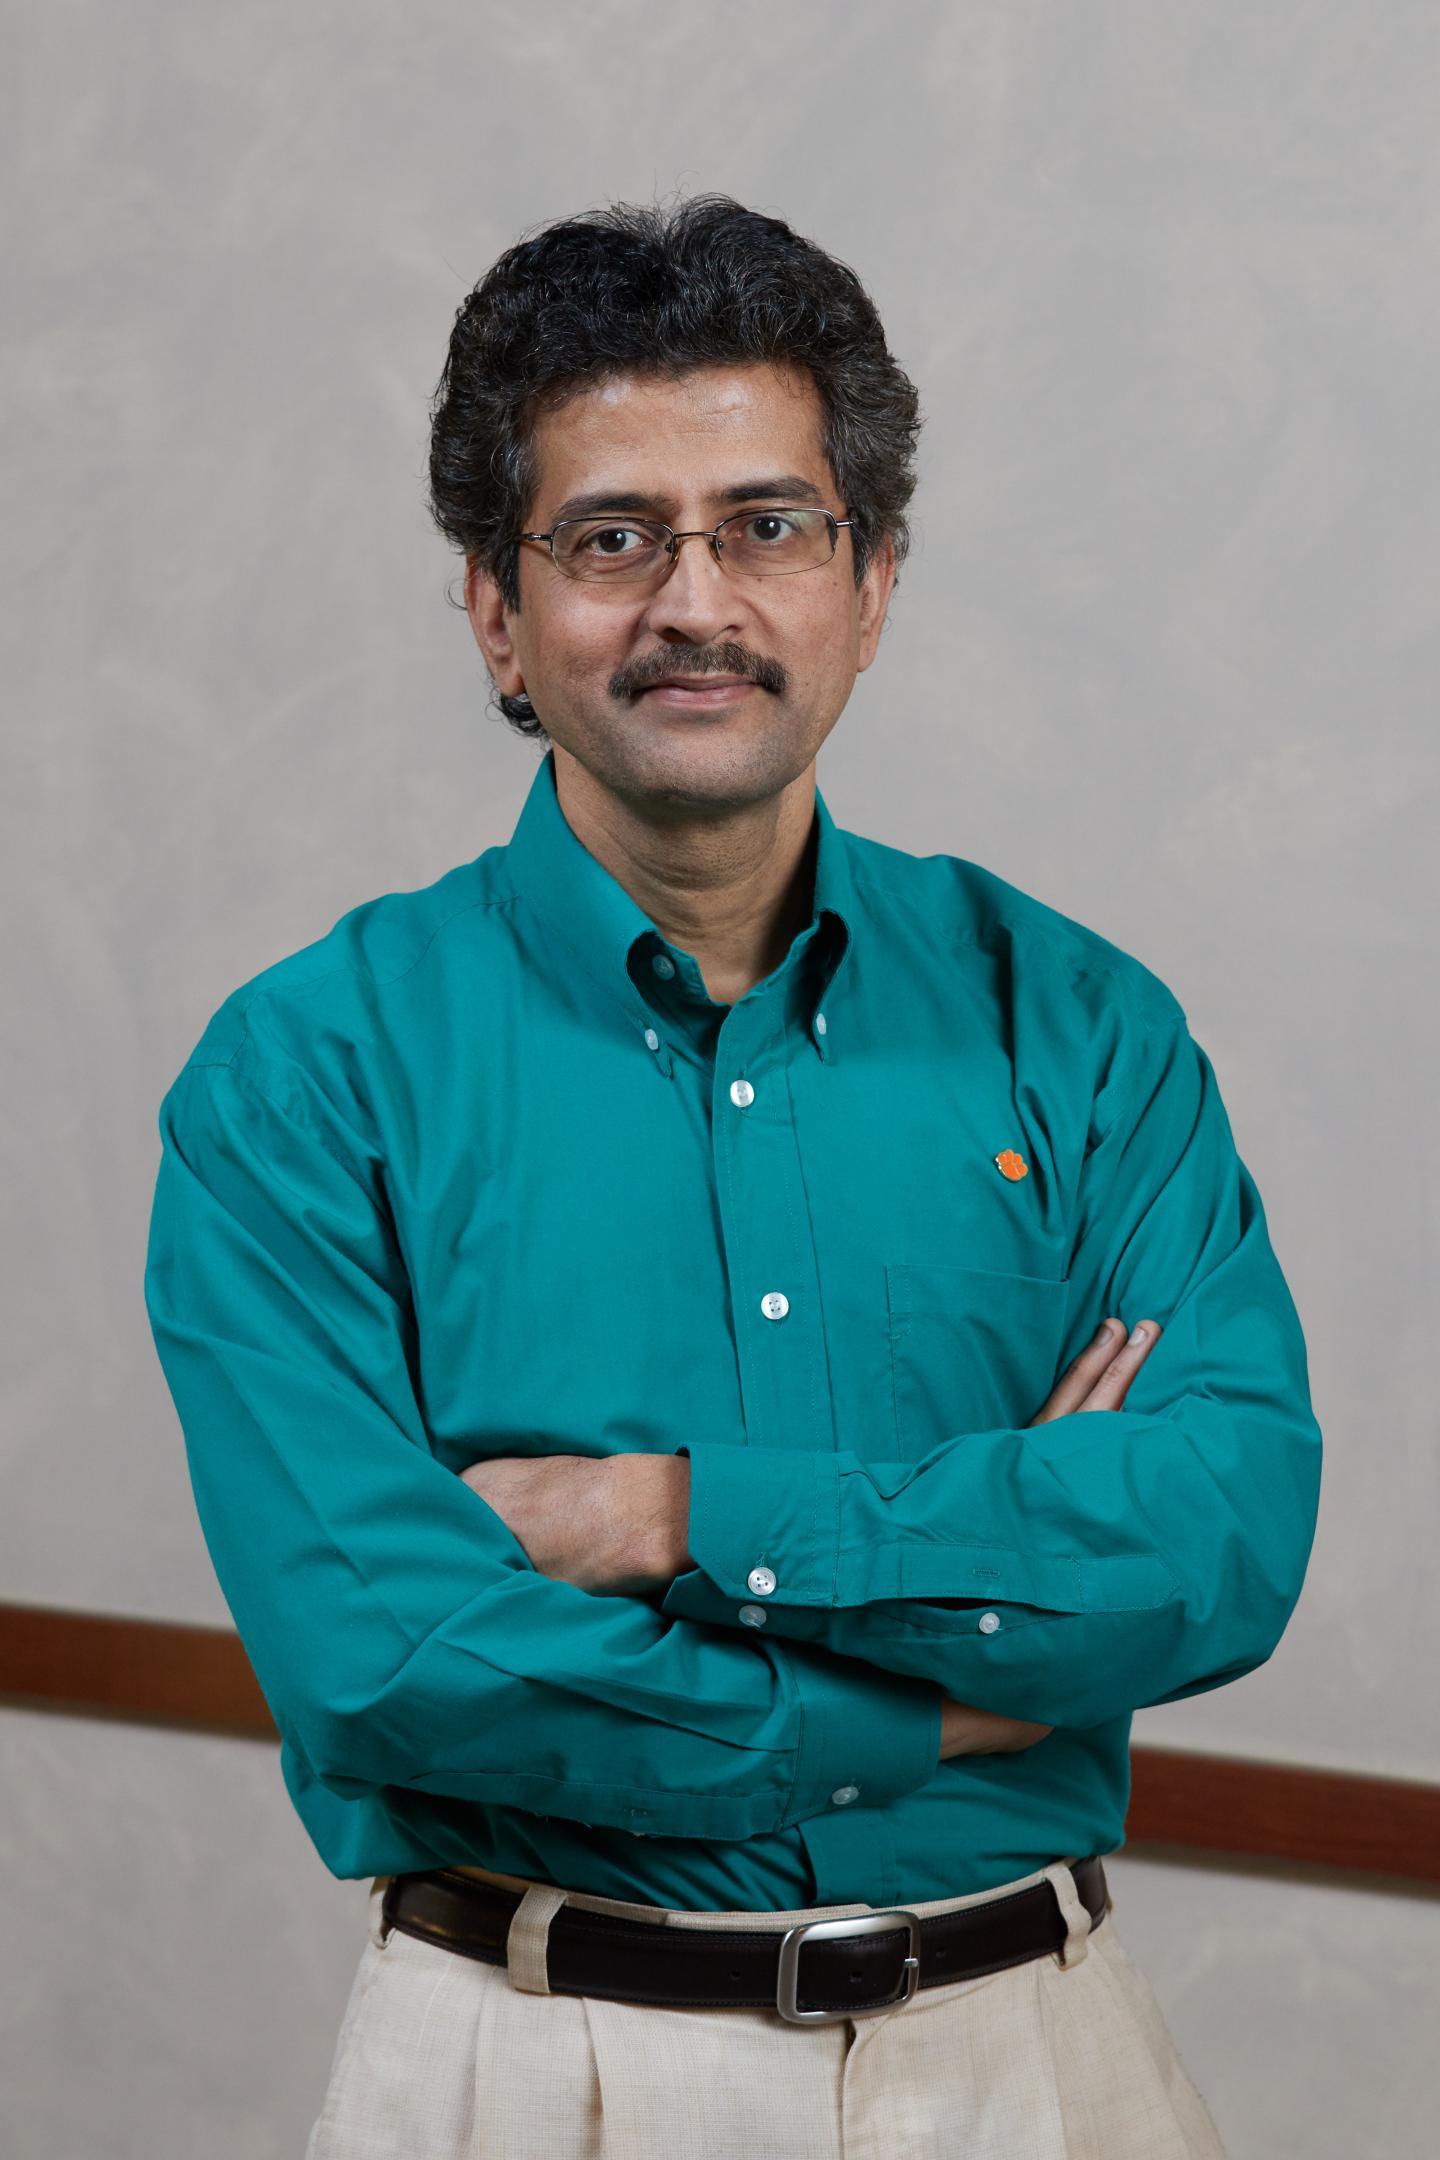 Profesor Apparao Rao, Clemson University